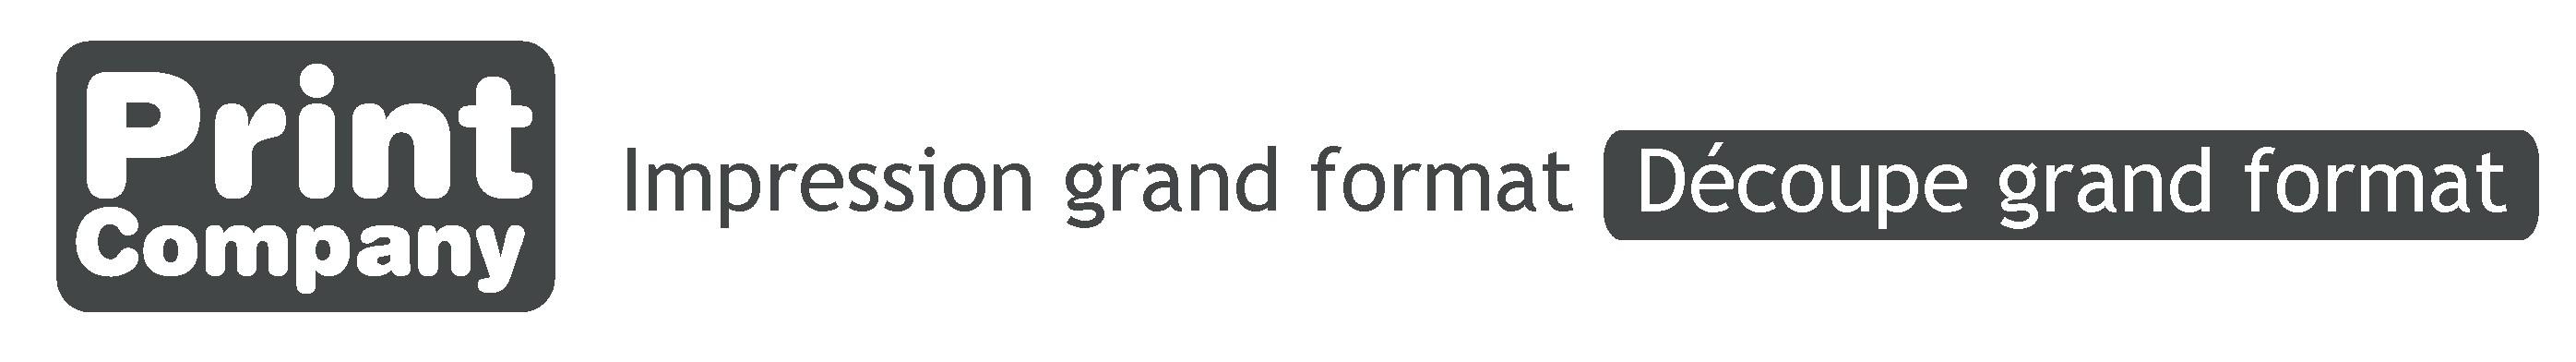 impression-grand-format-print-company-bandeau-2